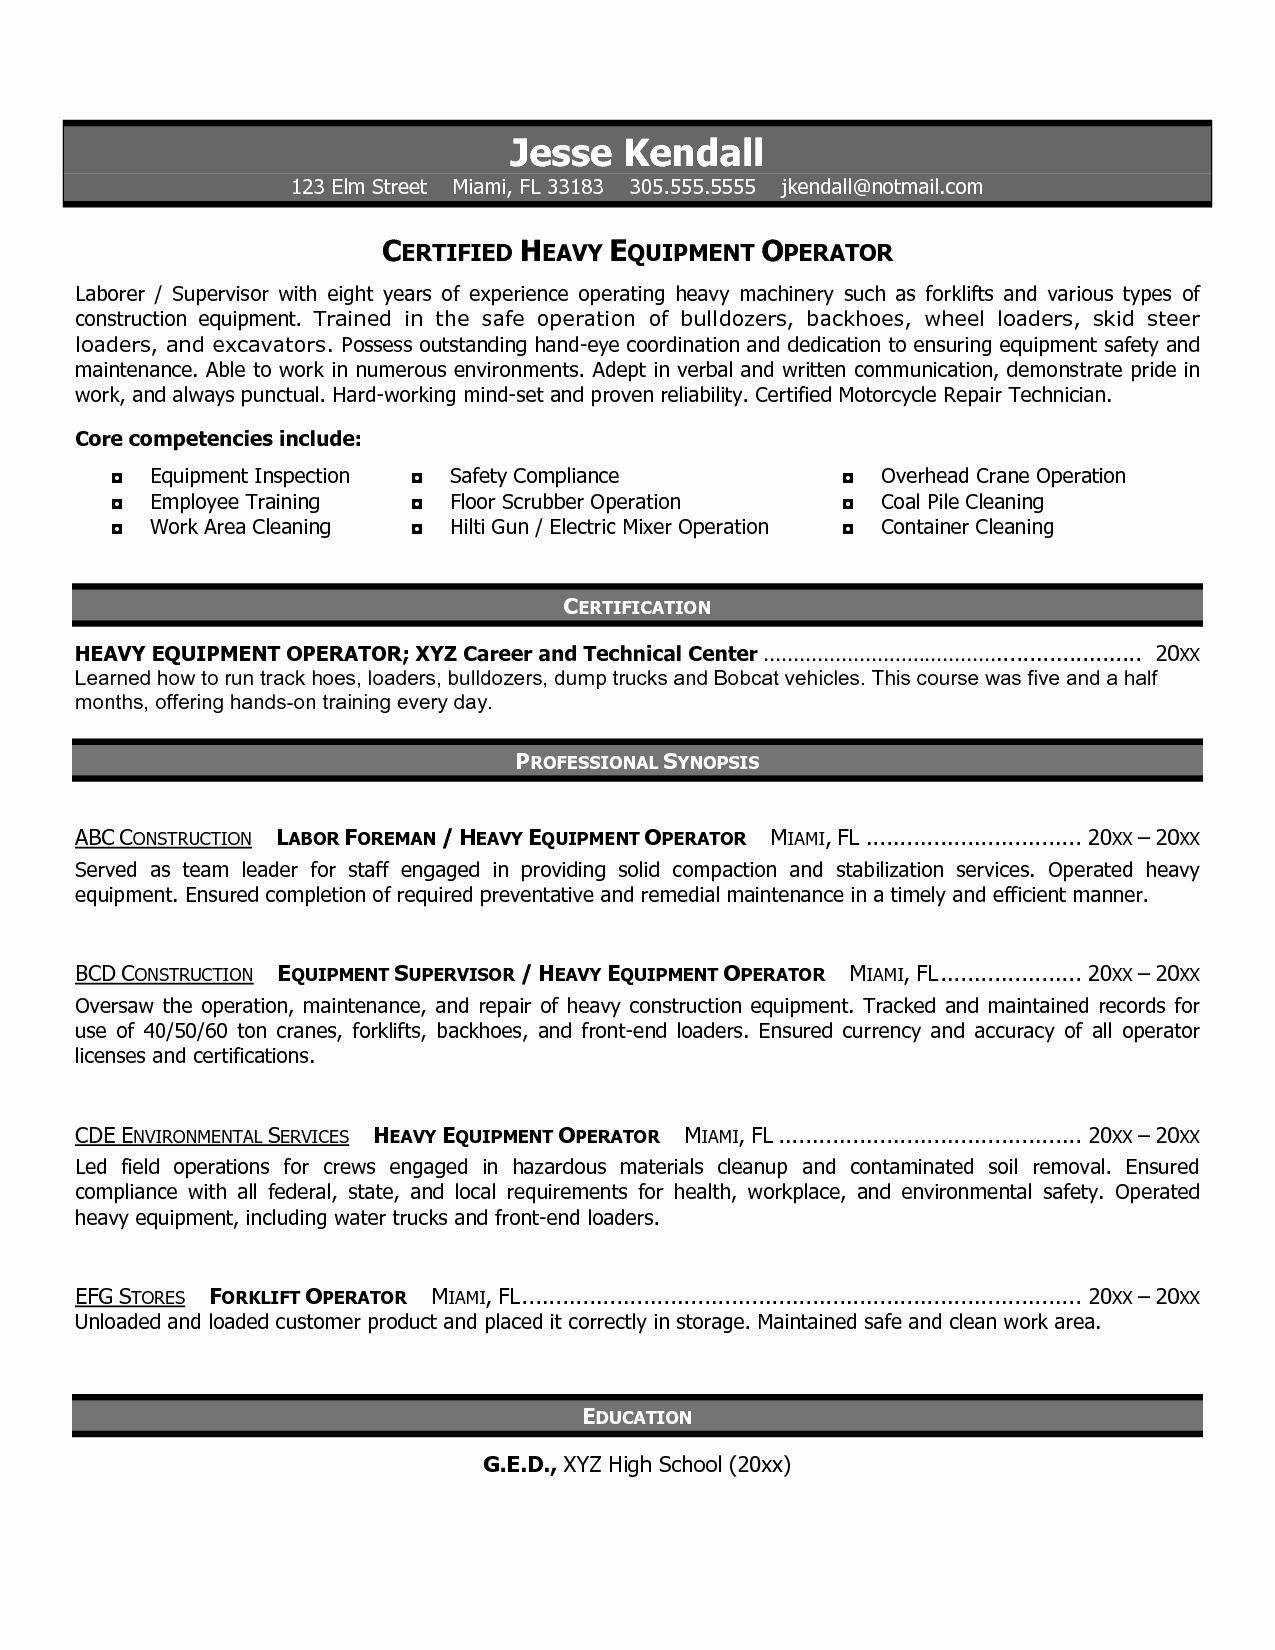 Heavy Equipment Operator Resume Objective